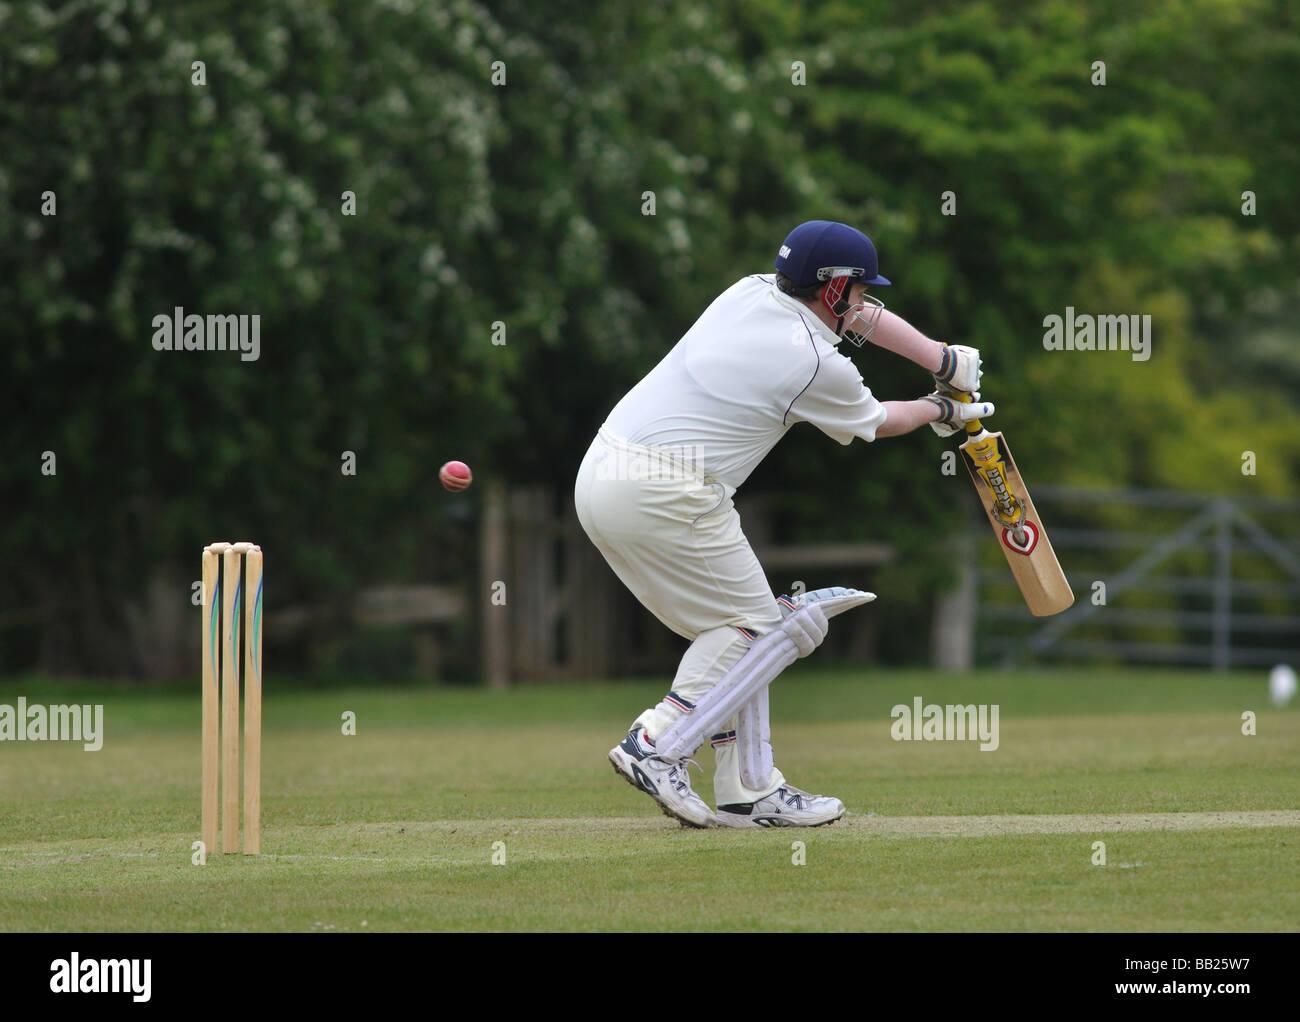 Cricket Village à Lapworth, Warwickshire, England, UK Photo Stock